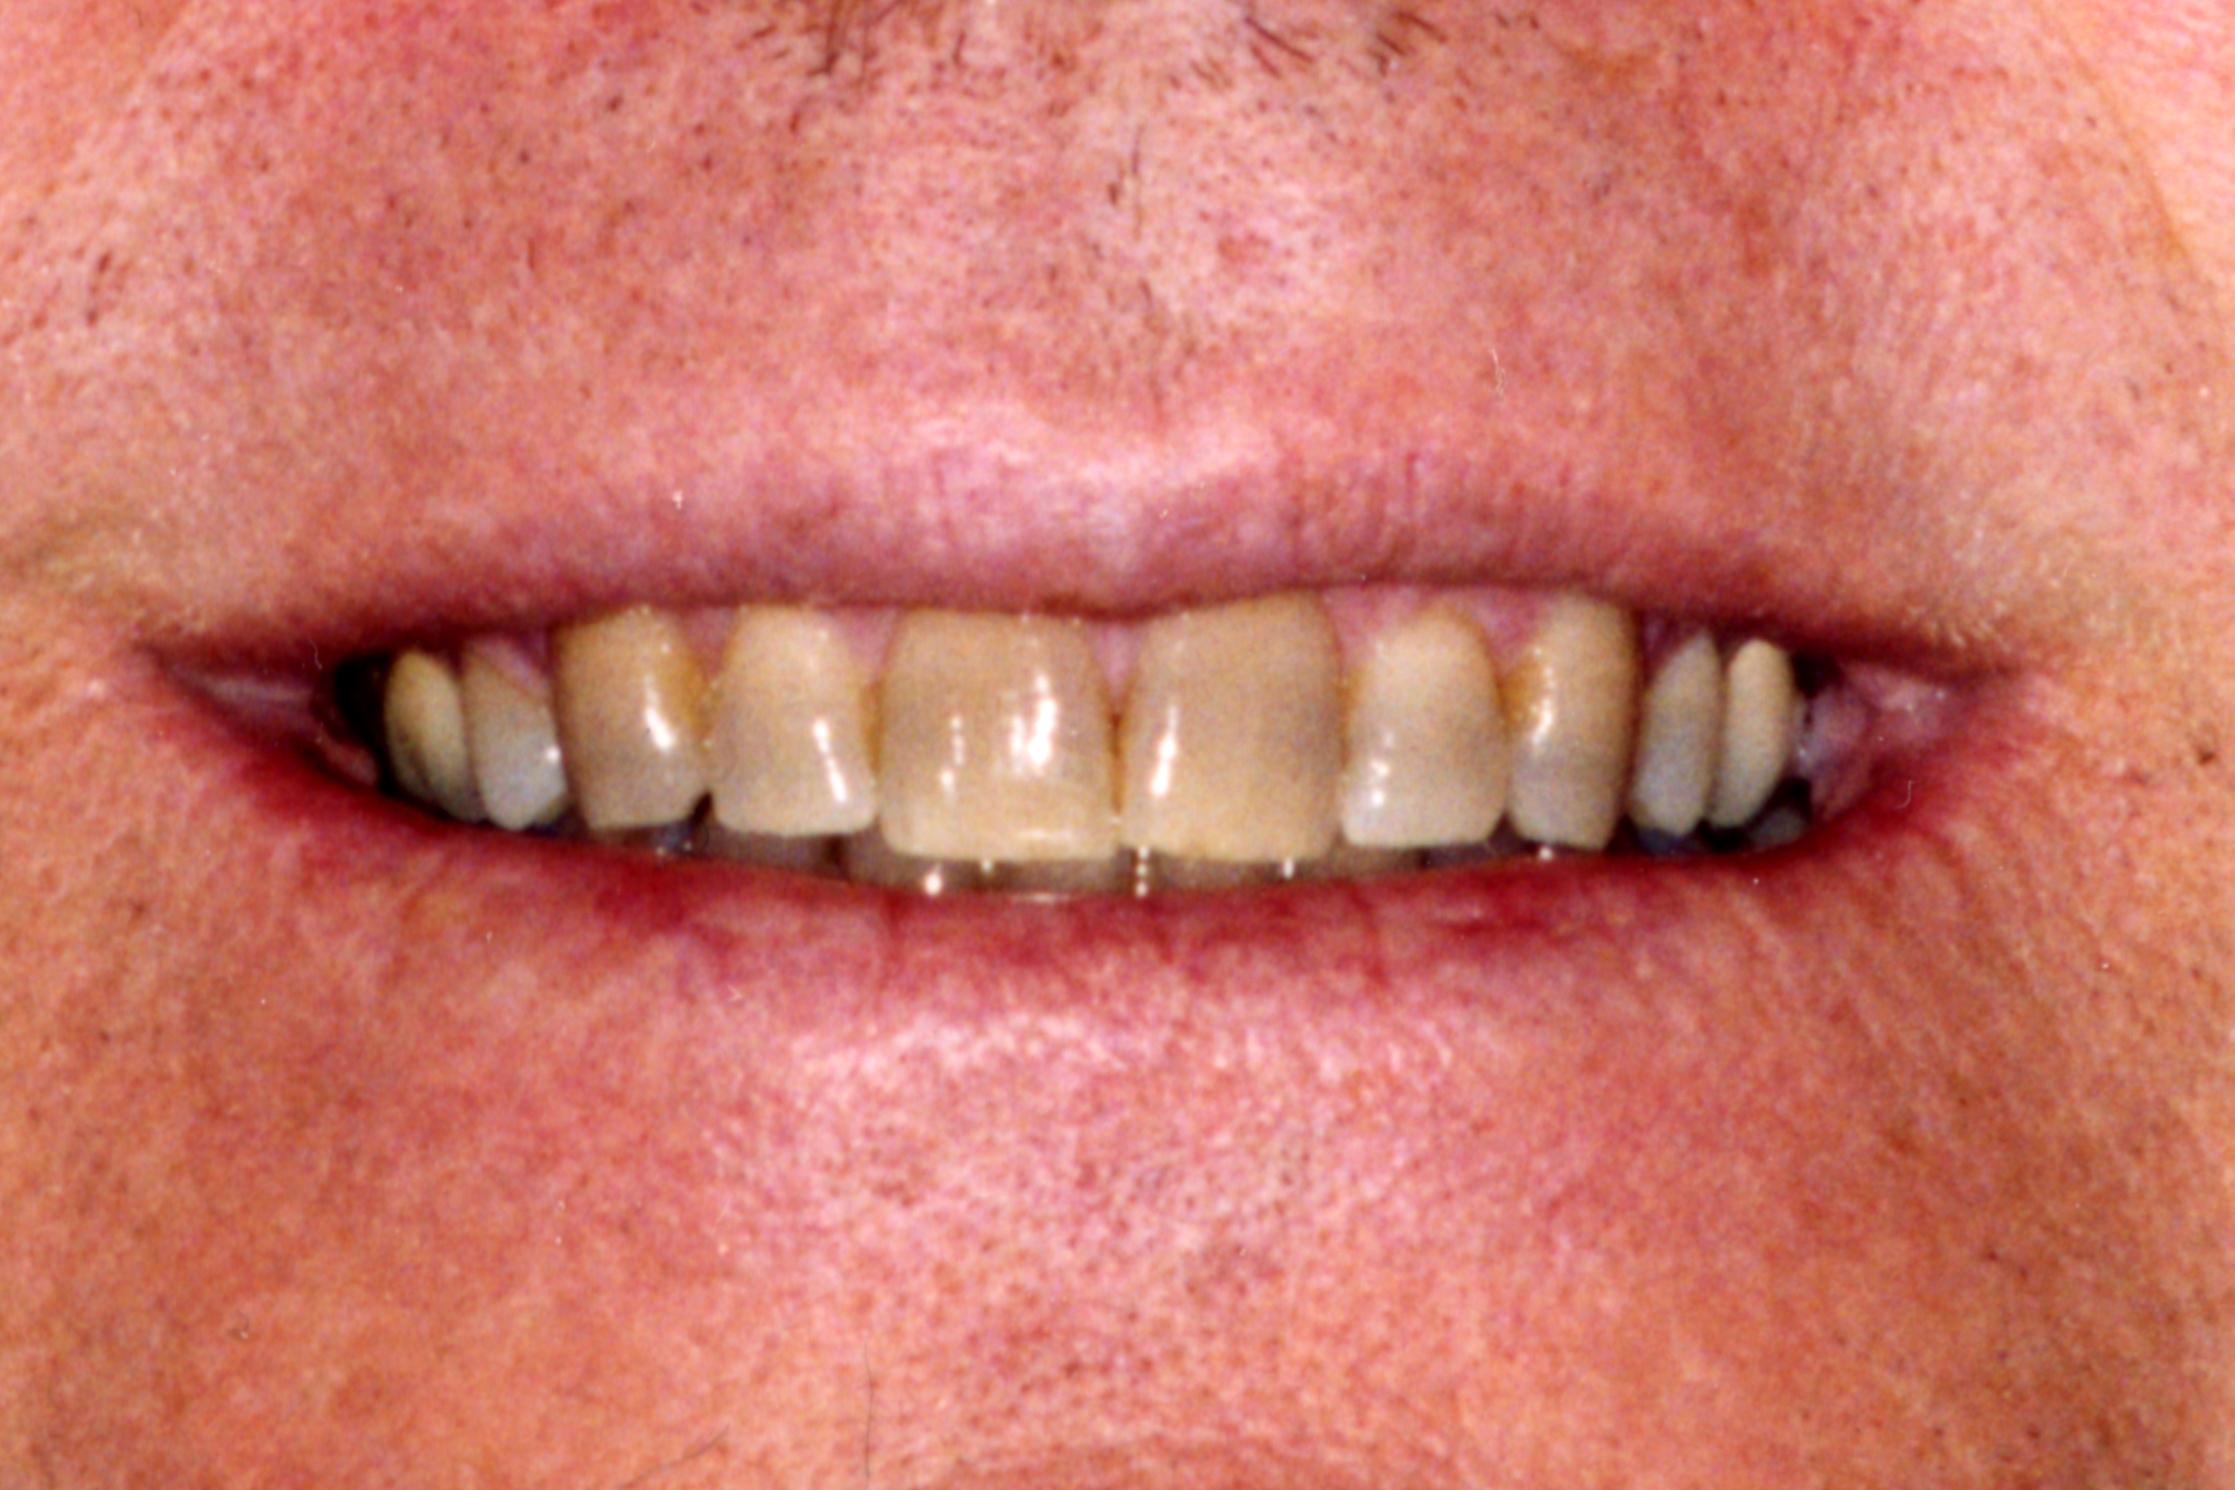 Before photo yellowed teeth